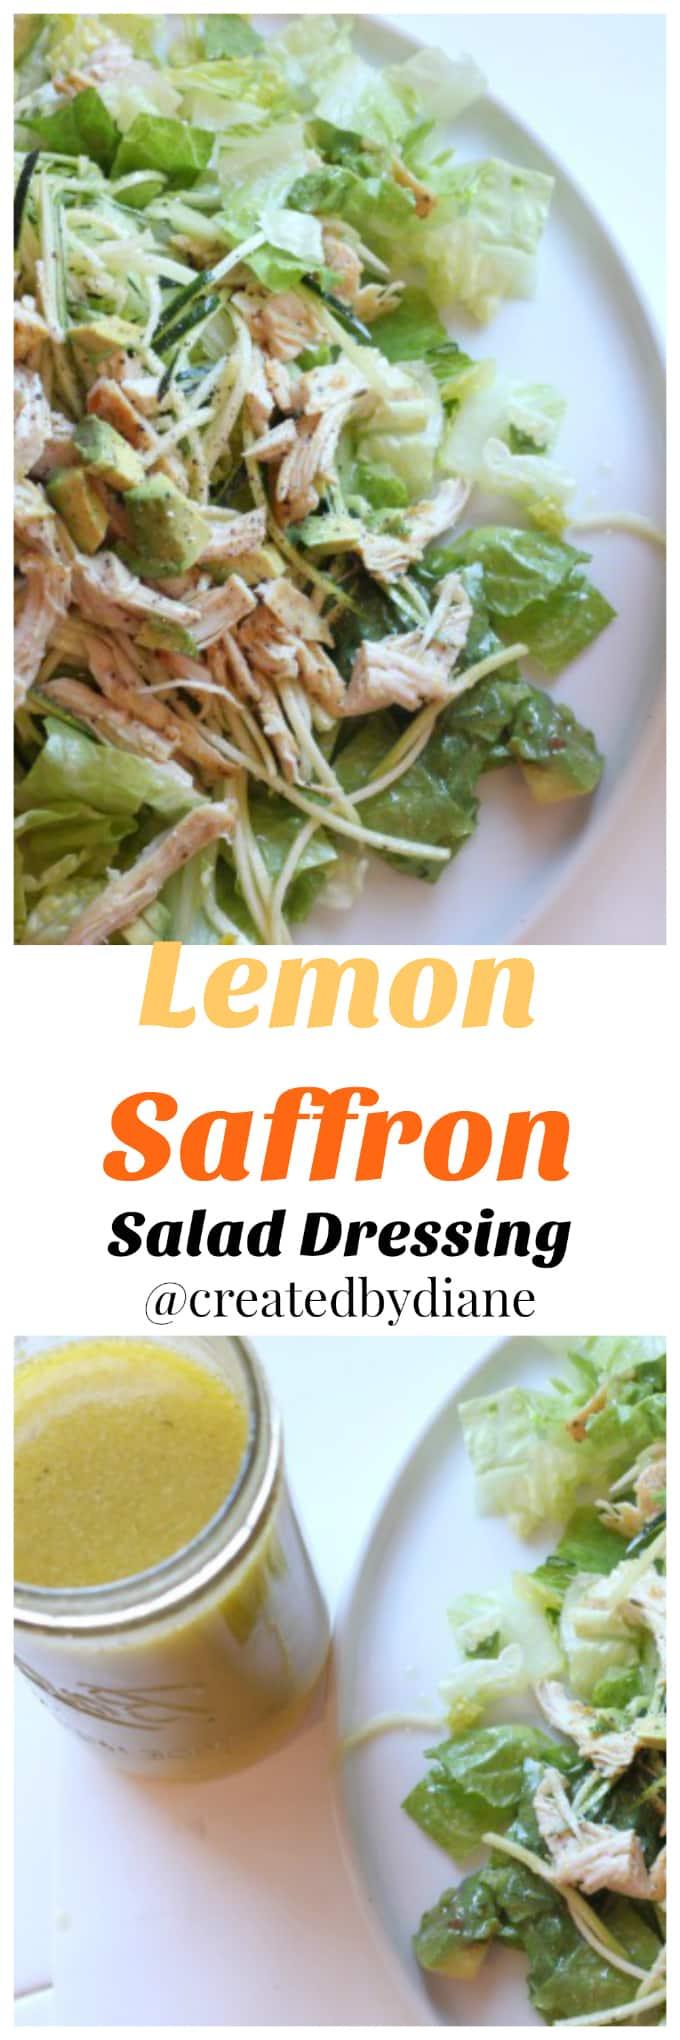 lemon-saffron-salad-dressing-createdbydiane